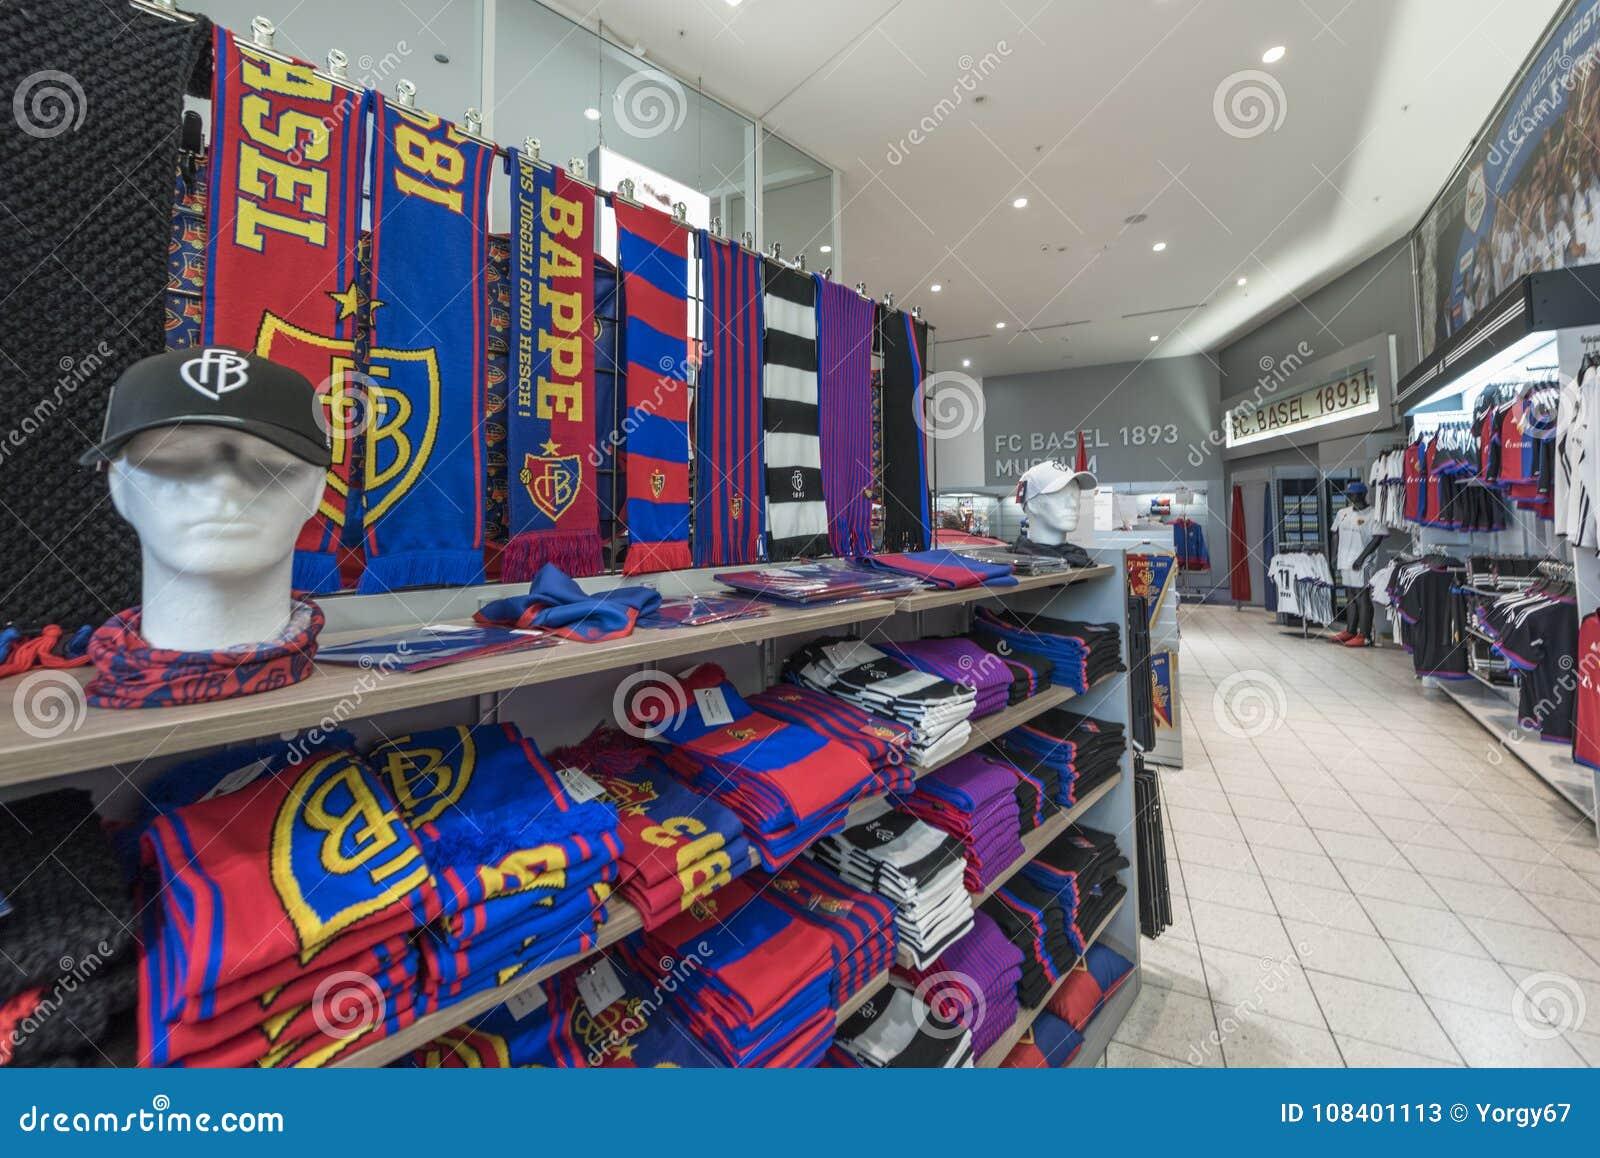 In Fc Basel Fan Shop Editorial Stock Photo Image Of Sale 108401113